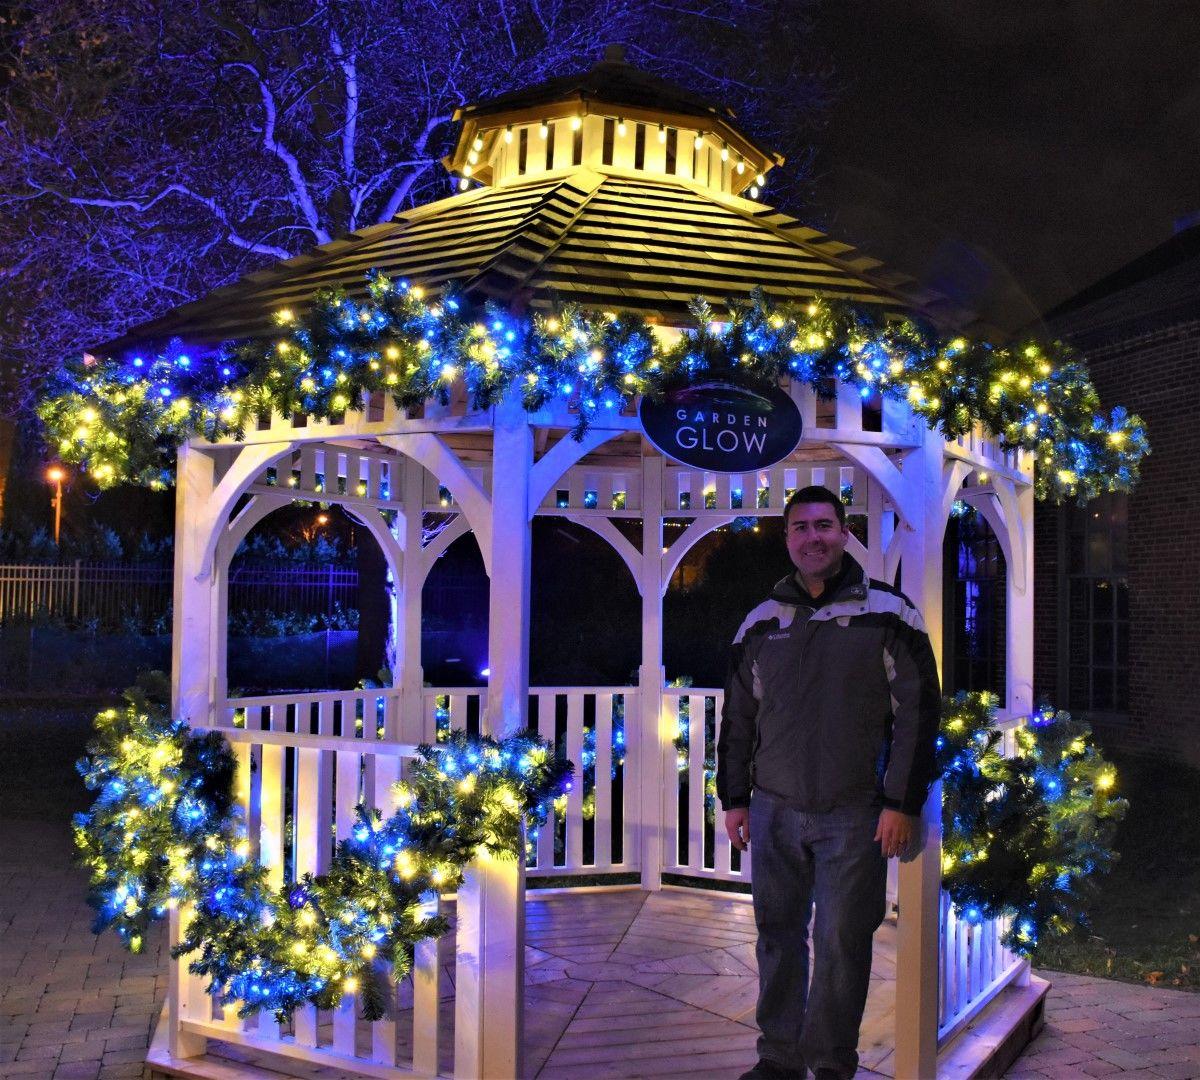 St Louis Garden Glow